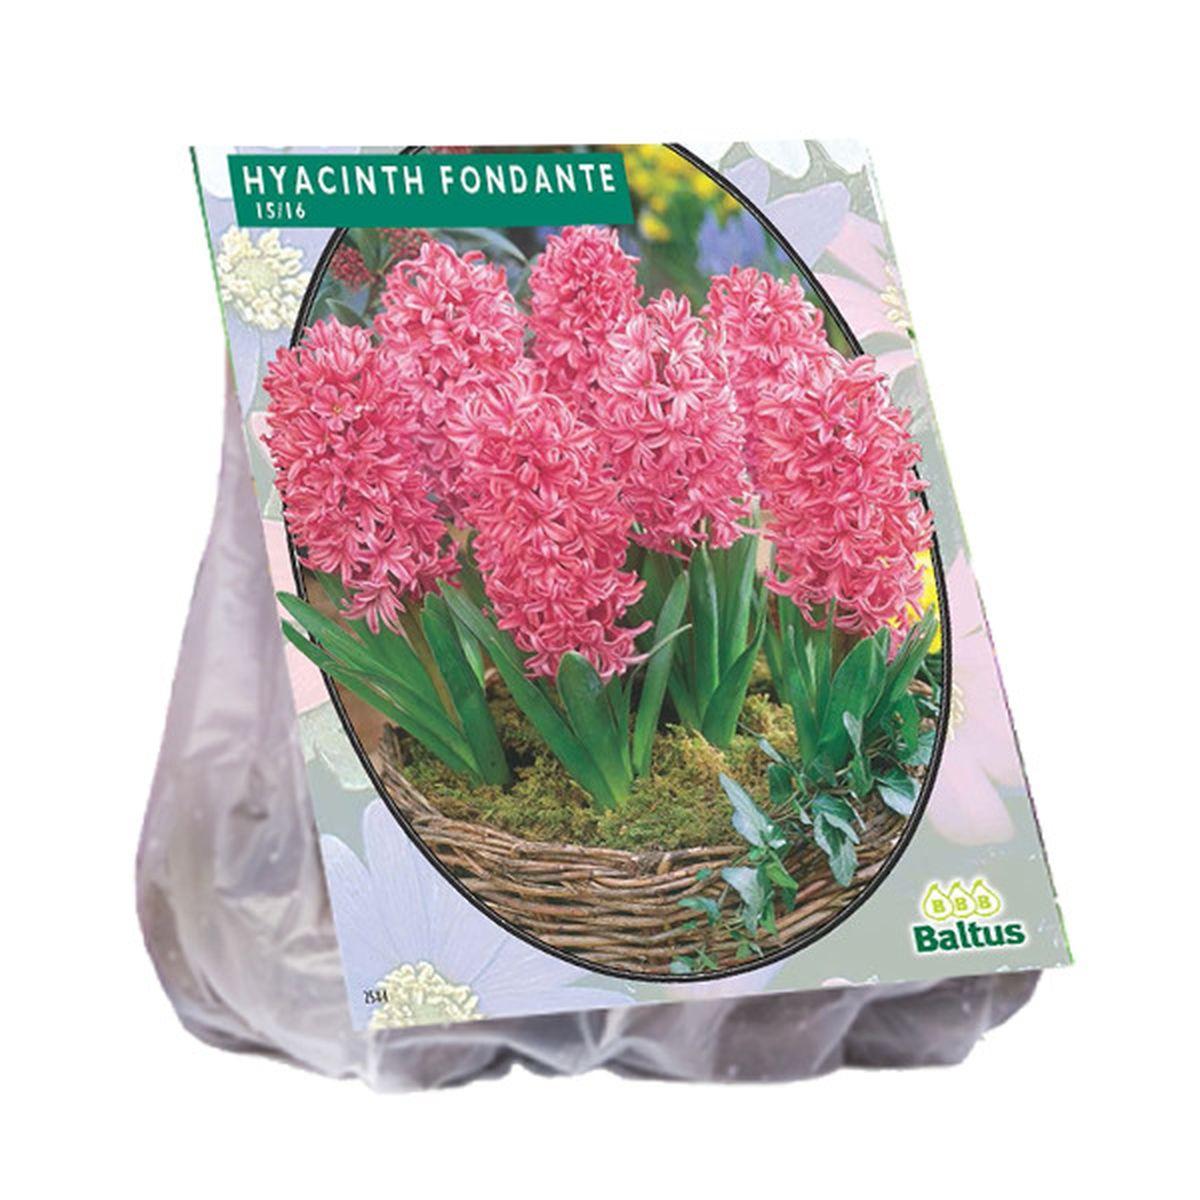 Hyacint Fondante